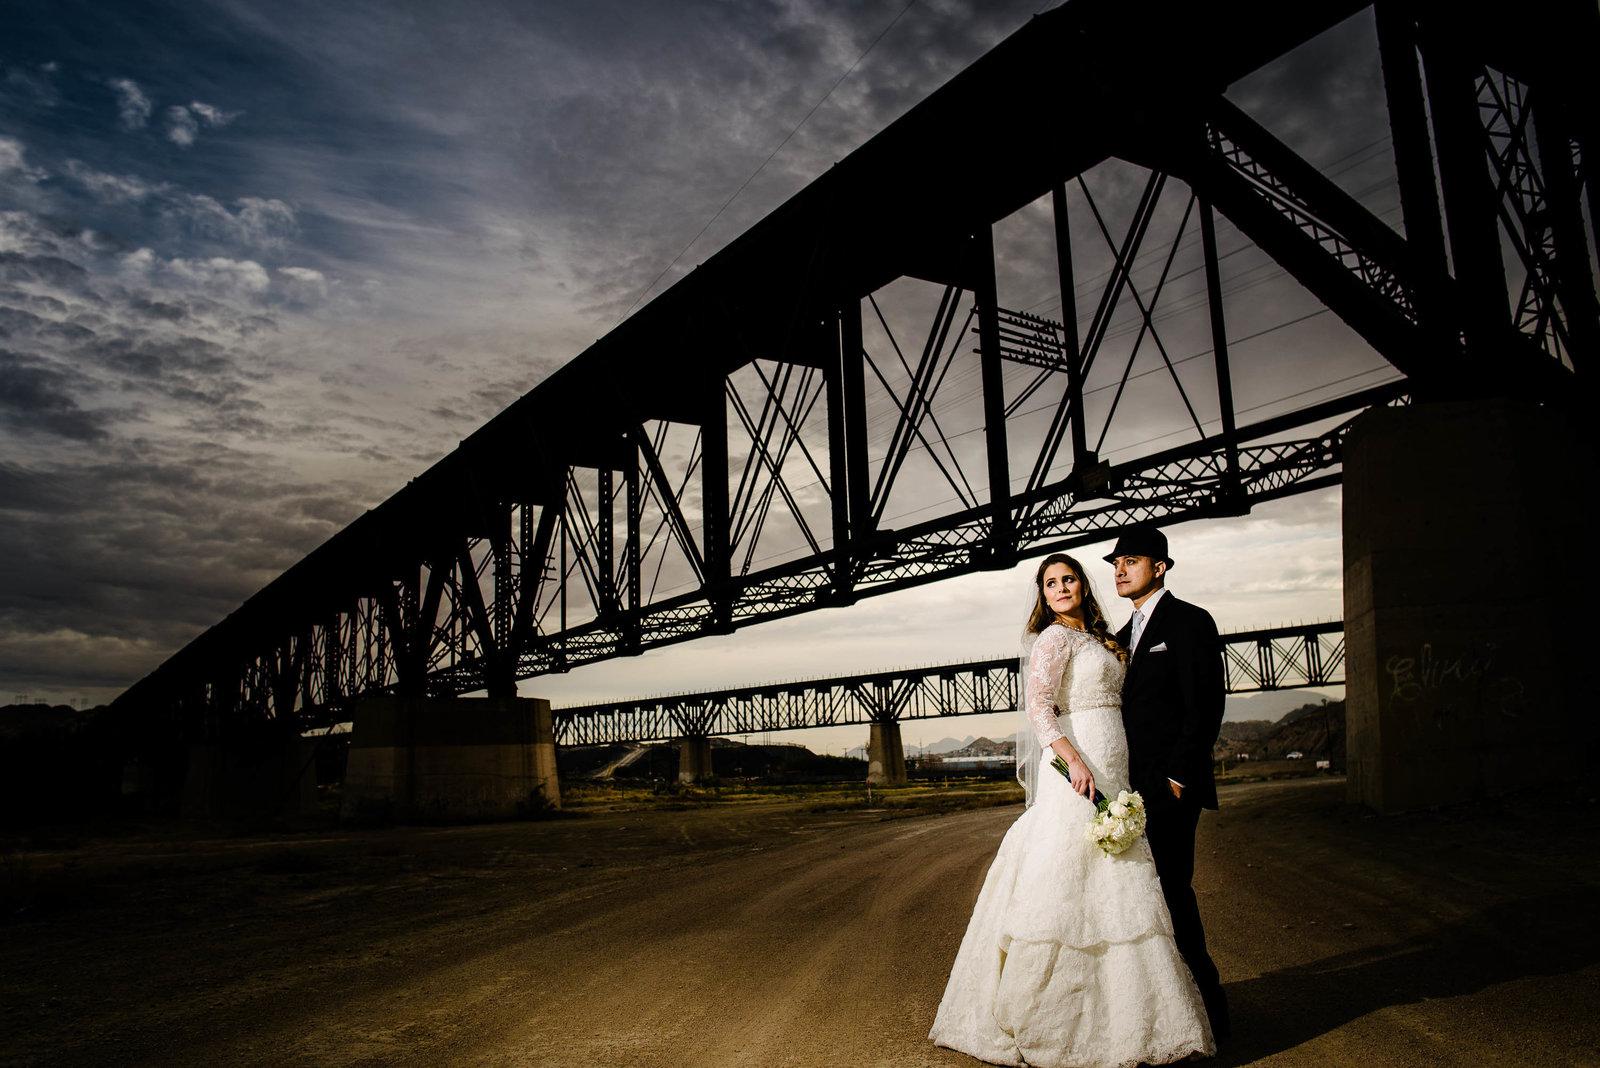 286-El-paso-wedding-photographer-AmJo_0648